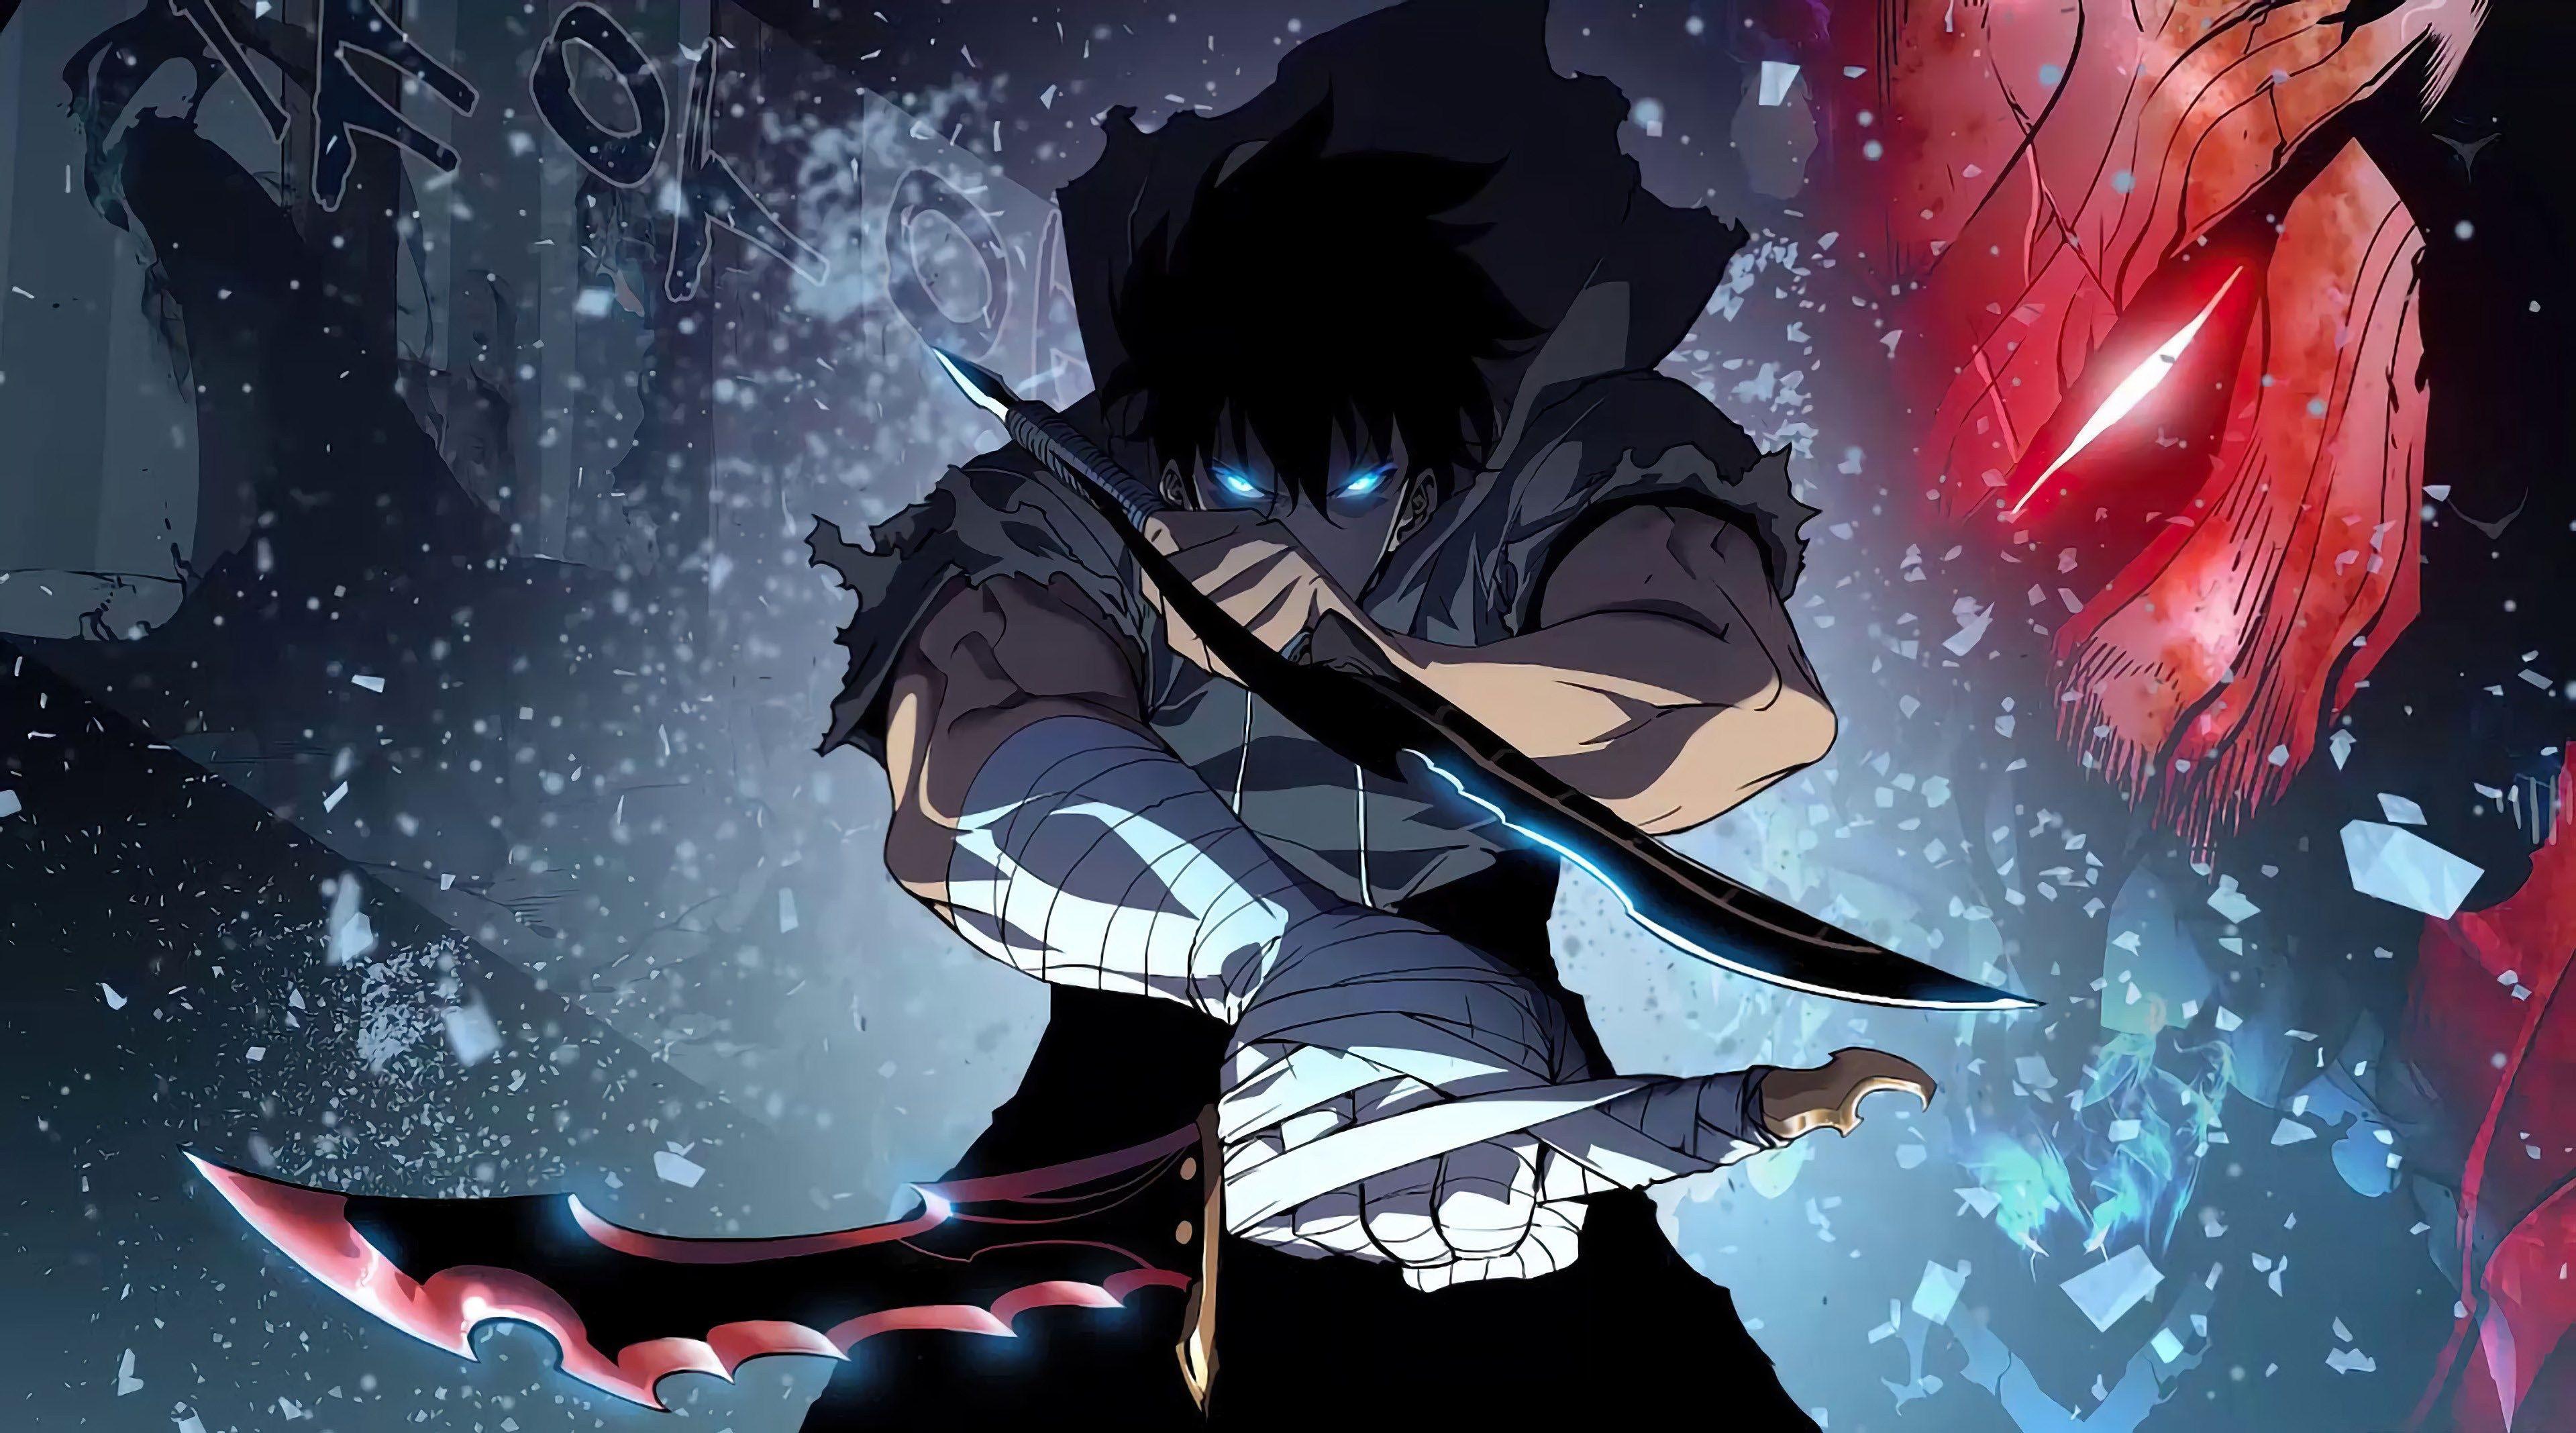 Wallpapers in 2020 Manga, Wallpaper, Character